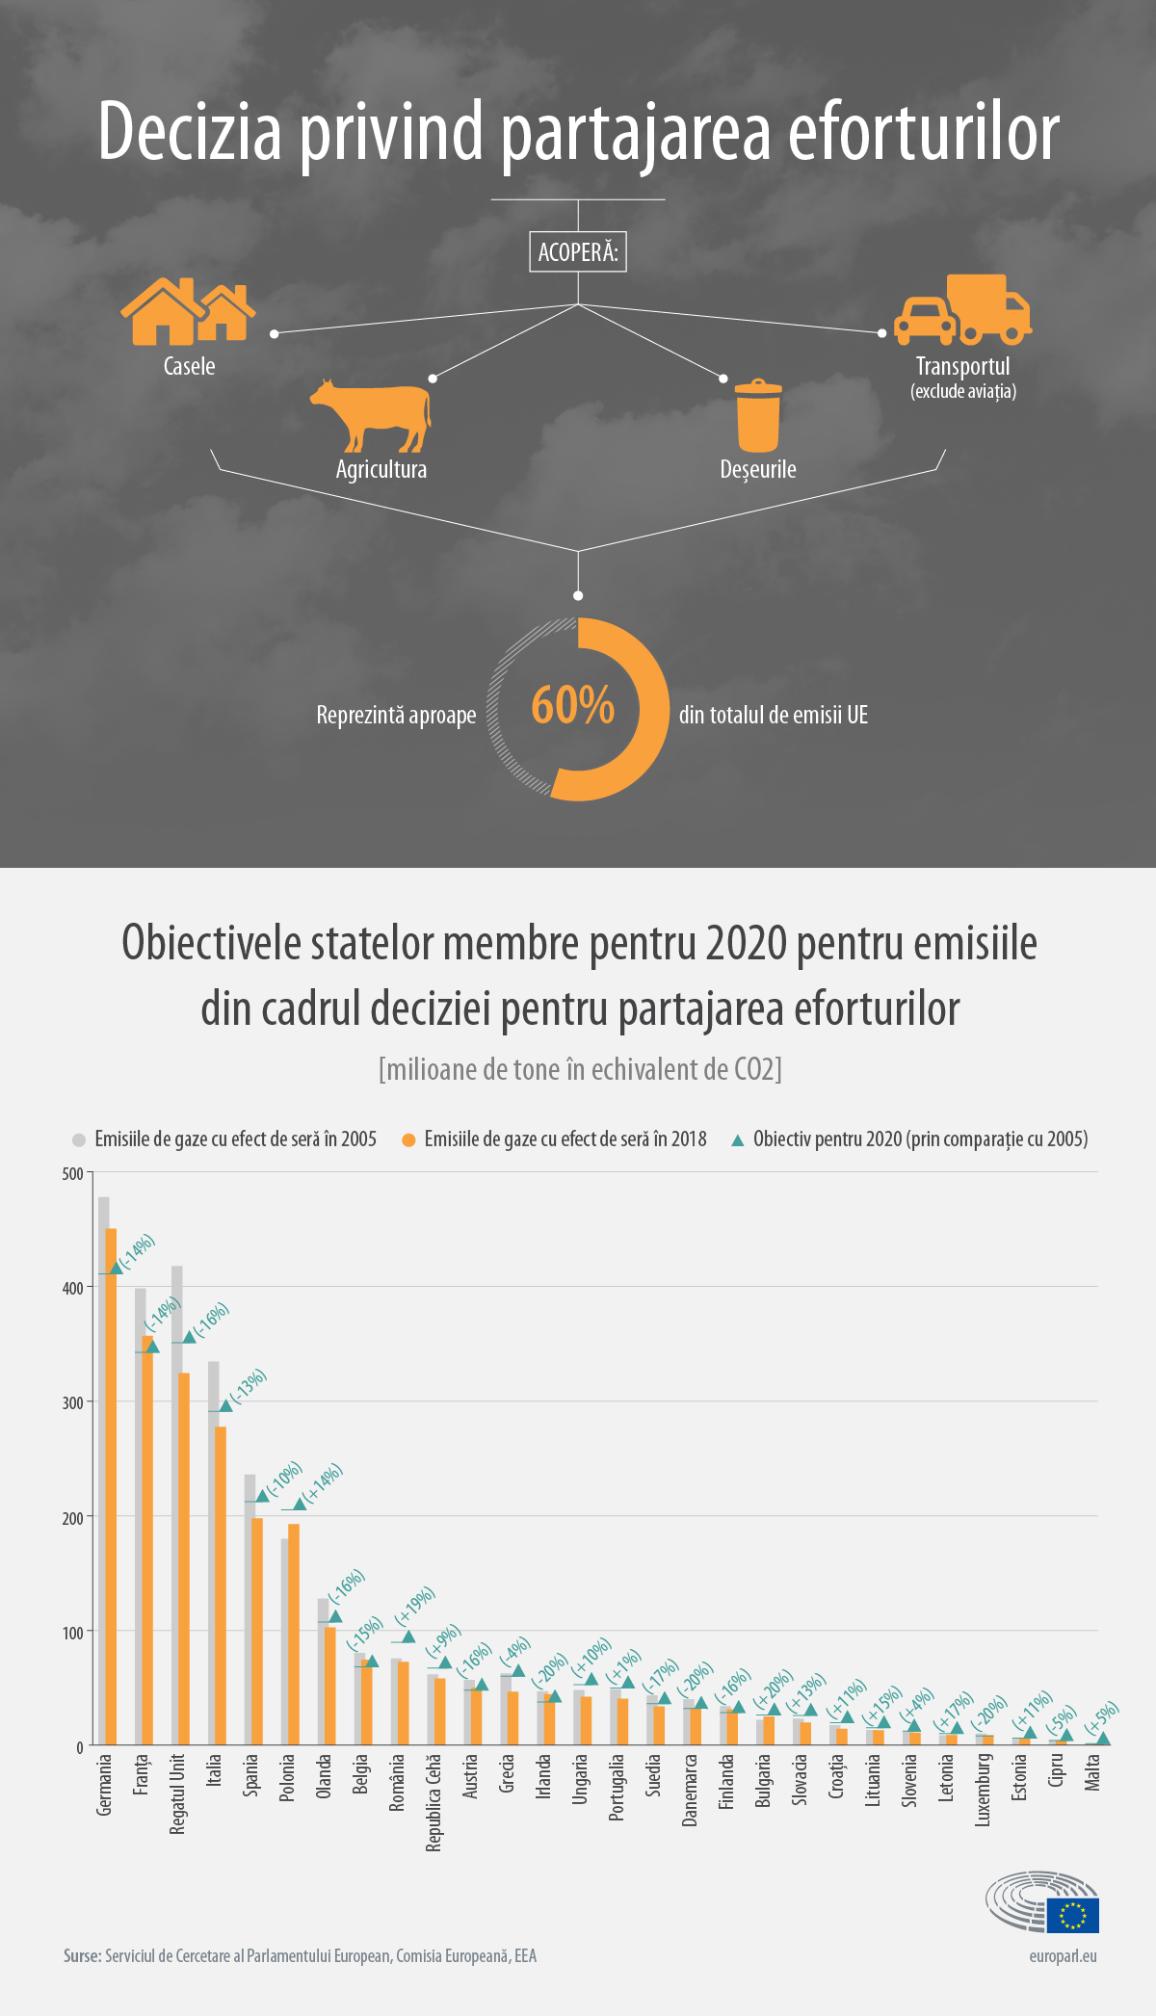 Partajarea eforturilor: infografic